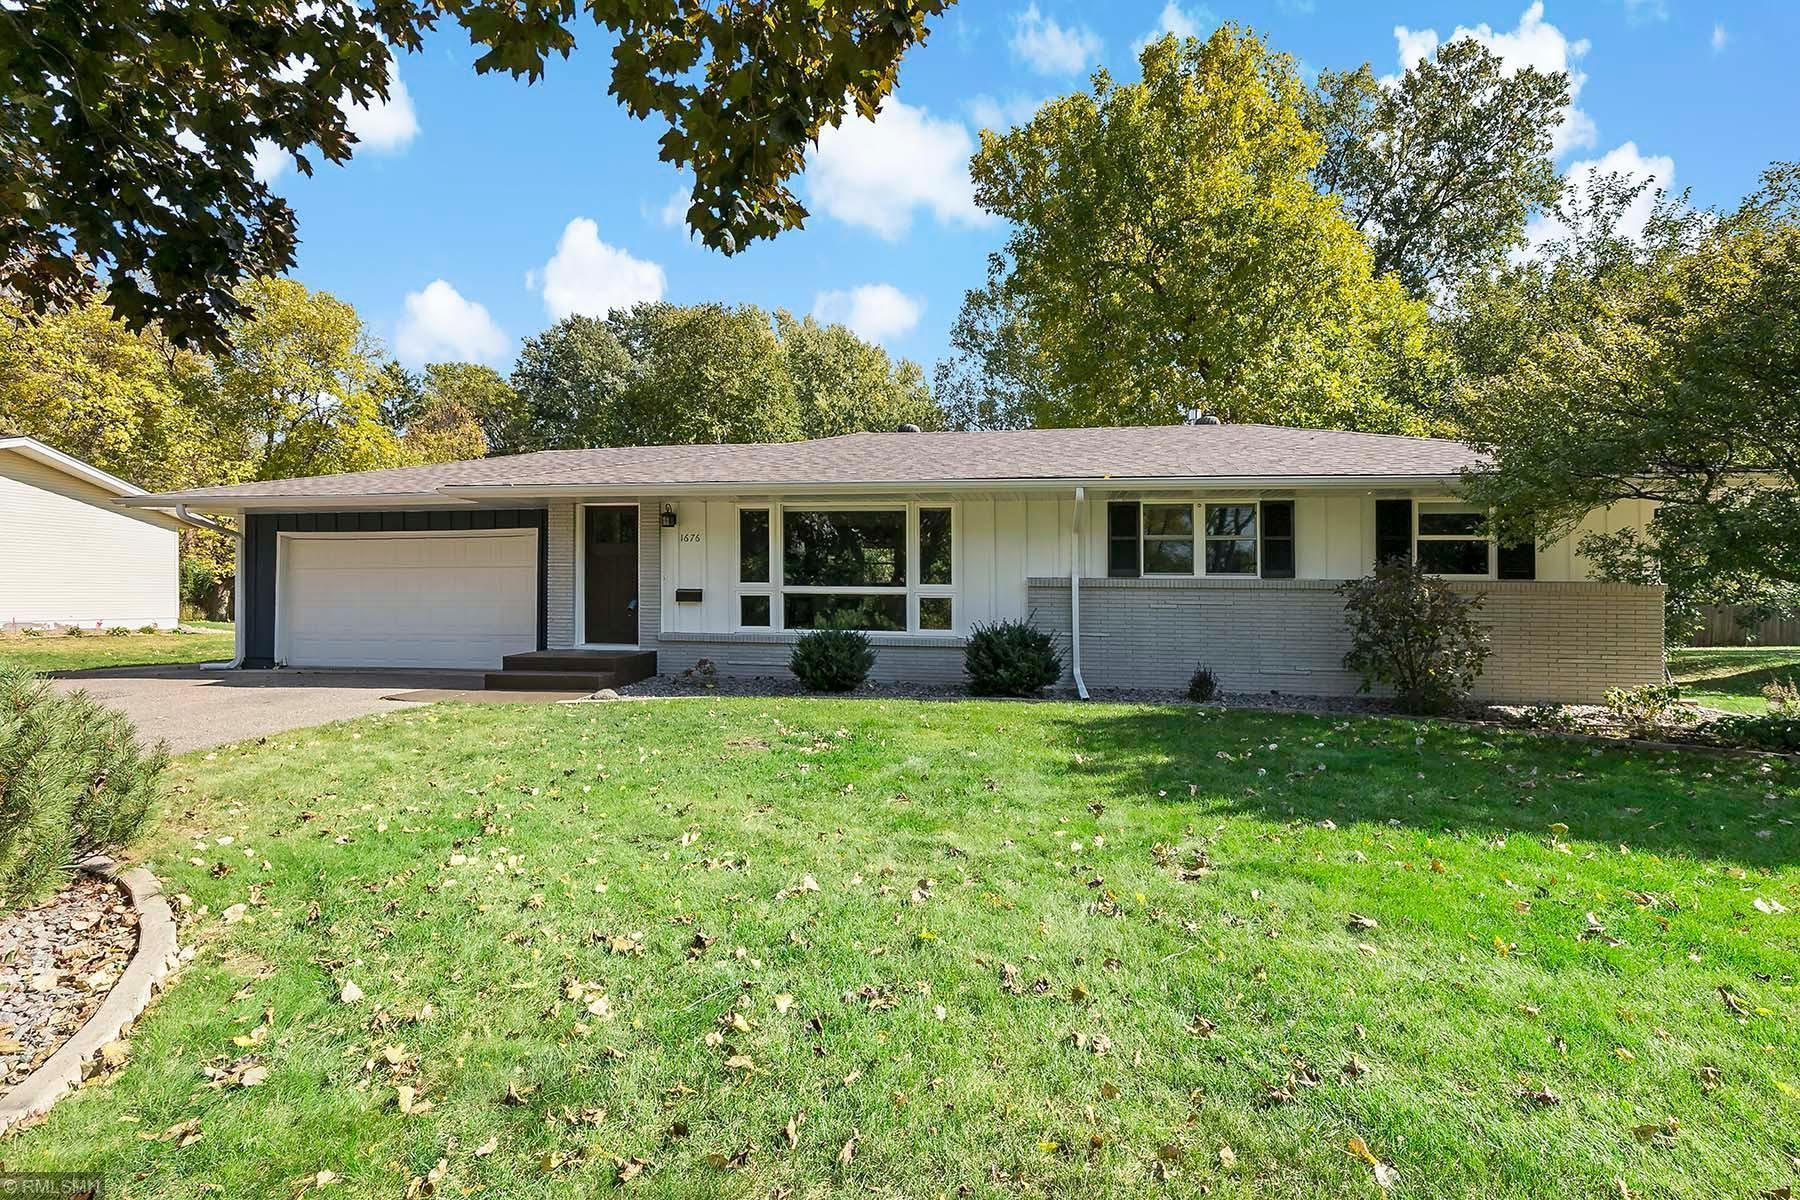 1676 Hampshire Lane N, Golden Valley, MN 55427 - MLS#: 5668779